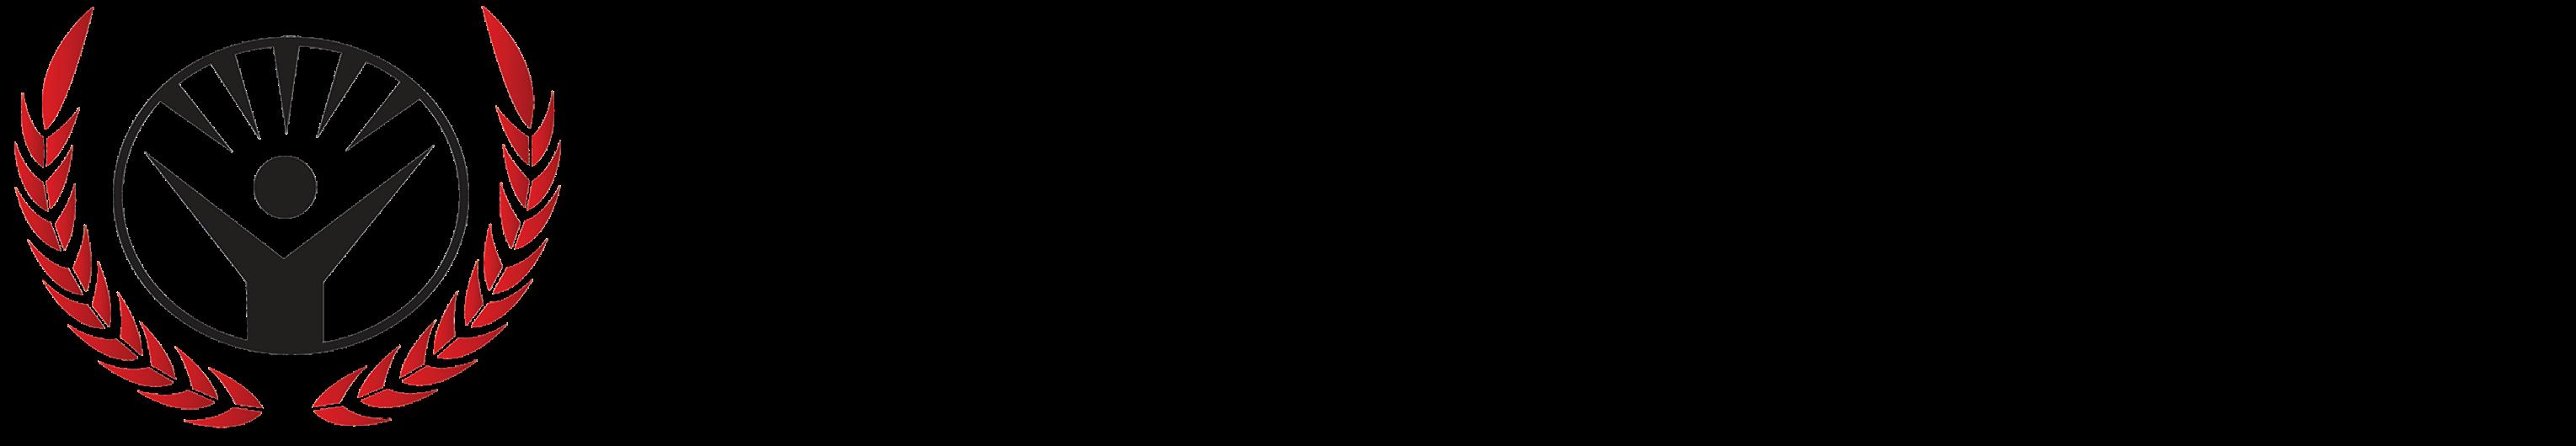 BYLP Horizontal Logo